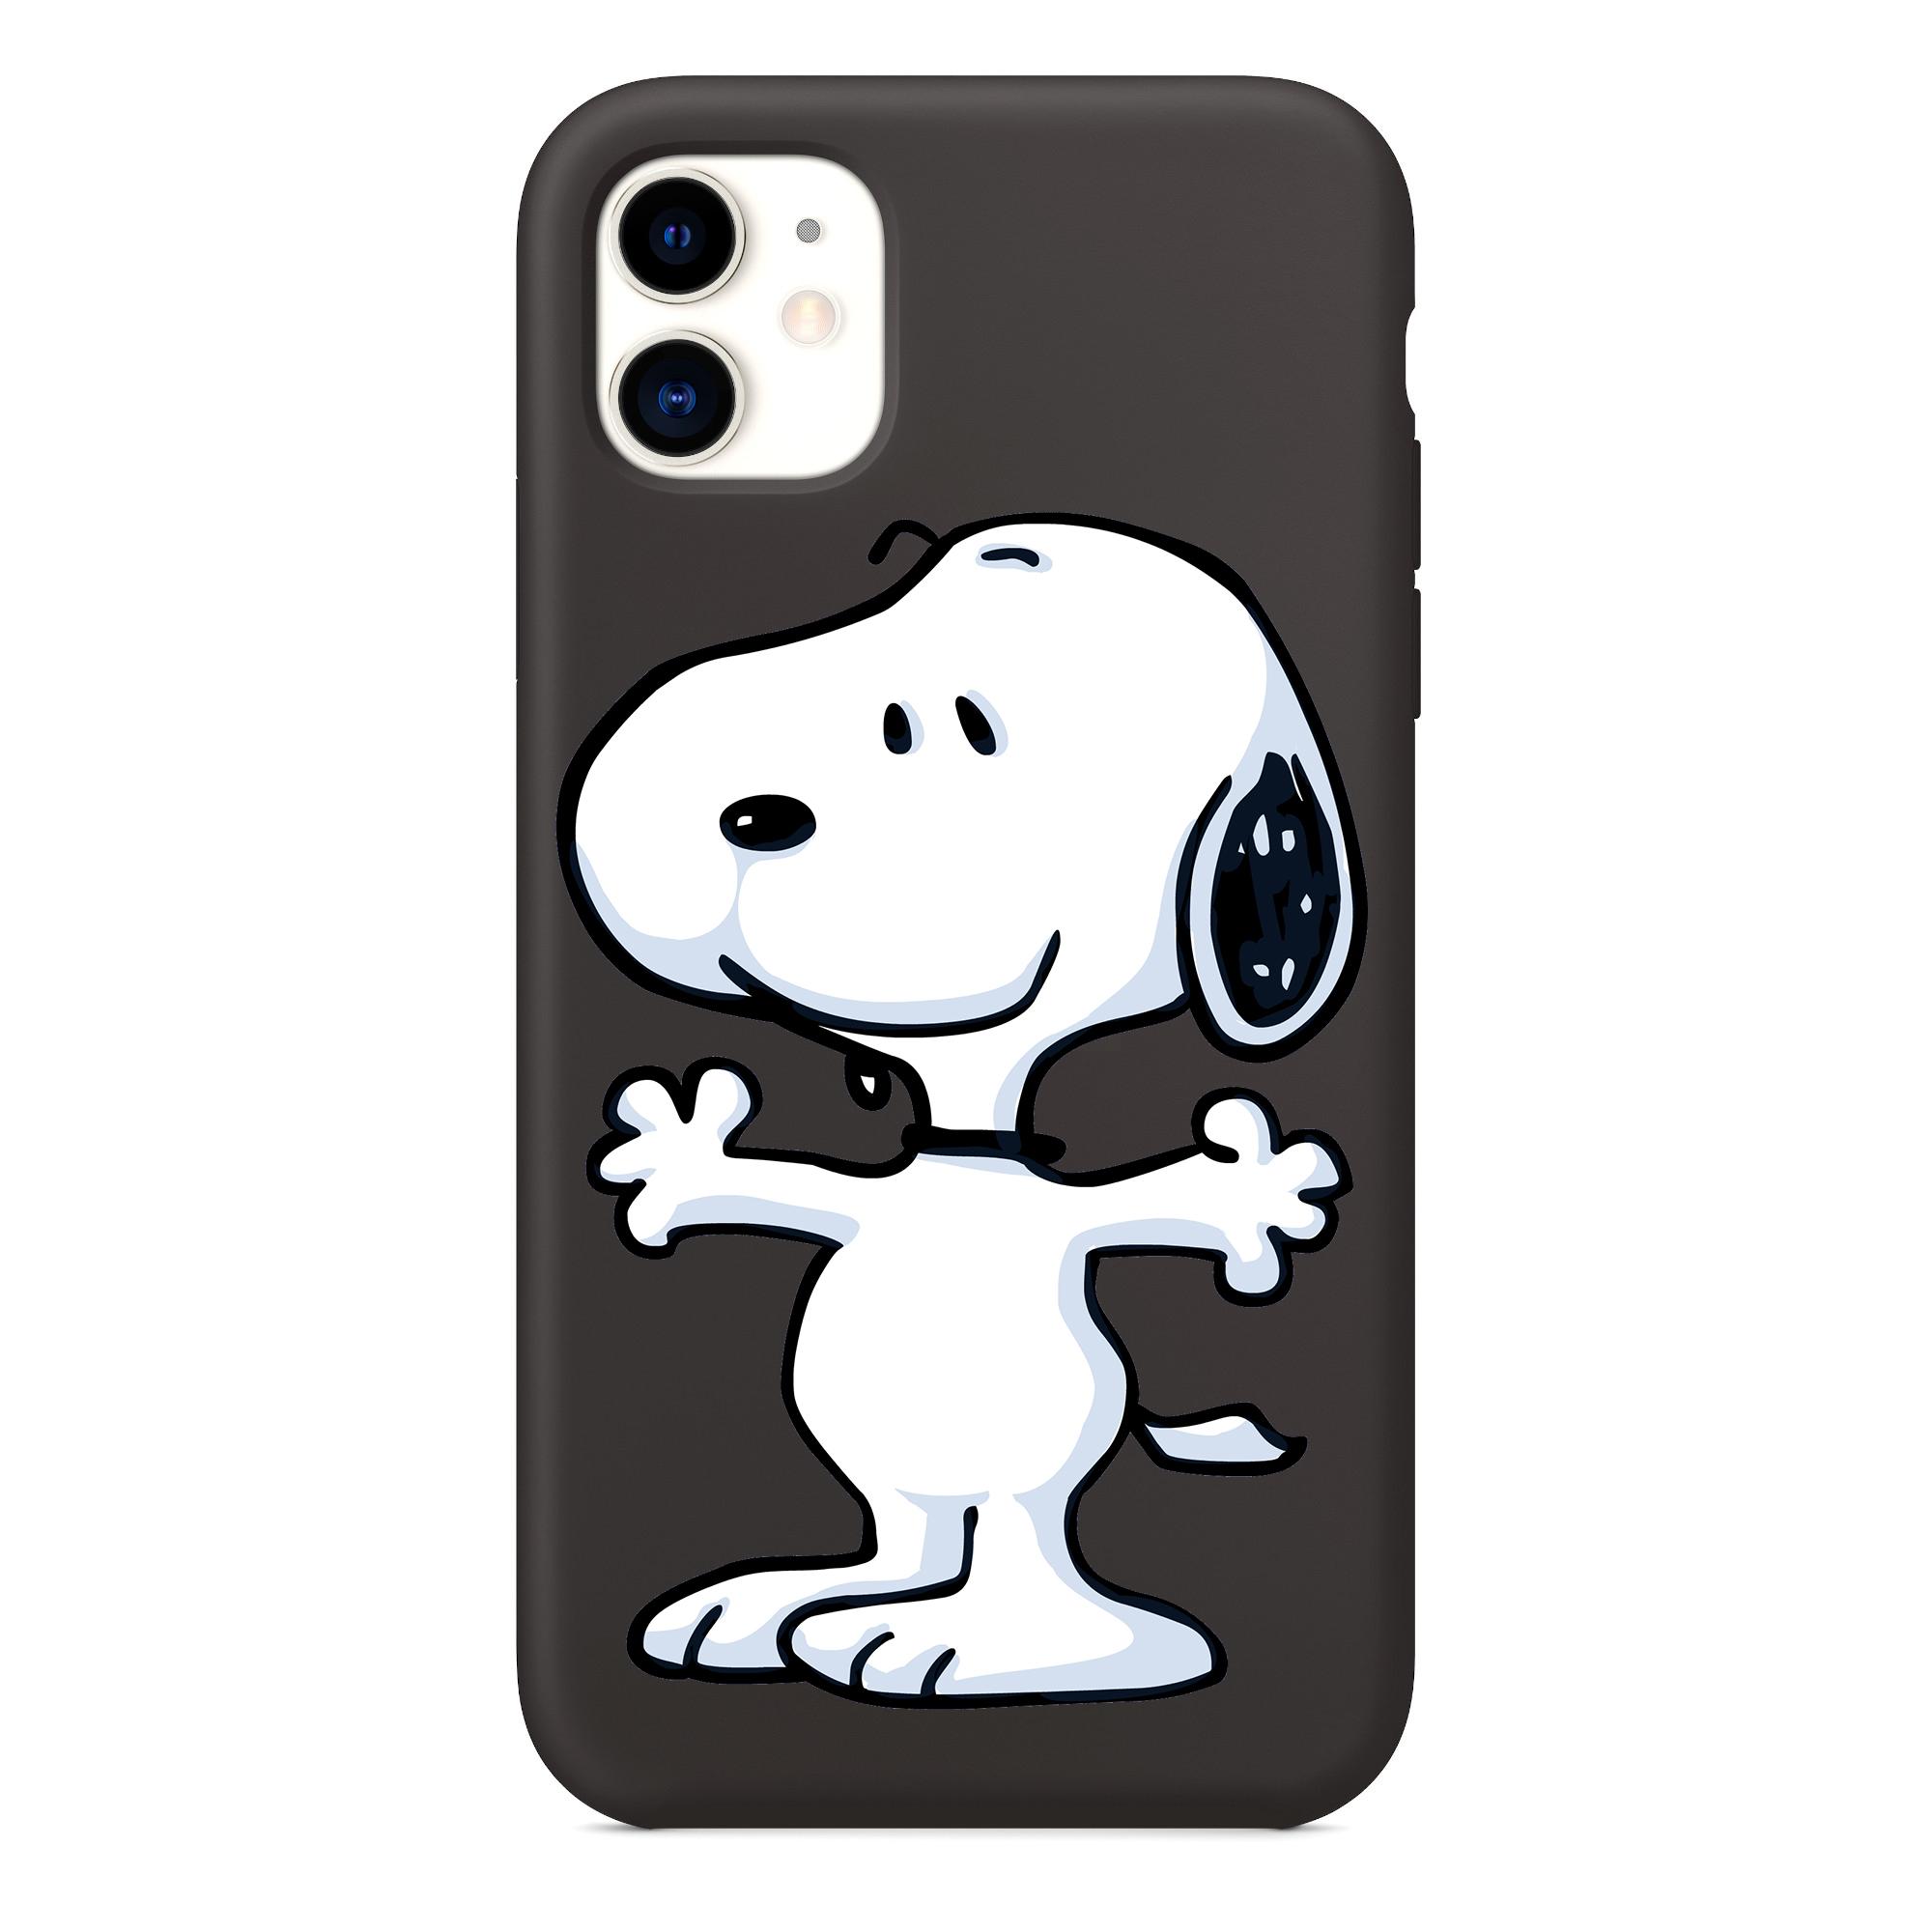 Snoopy Peanuts pour iPhone, Snoopy Peanuts Clipart iPhone 11 coque de téléphone